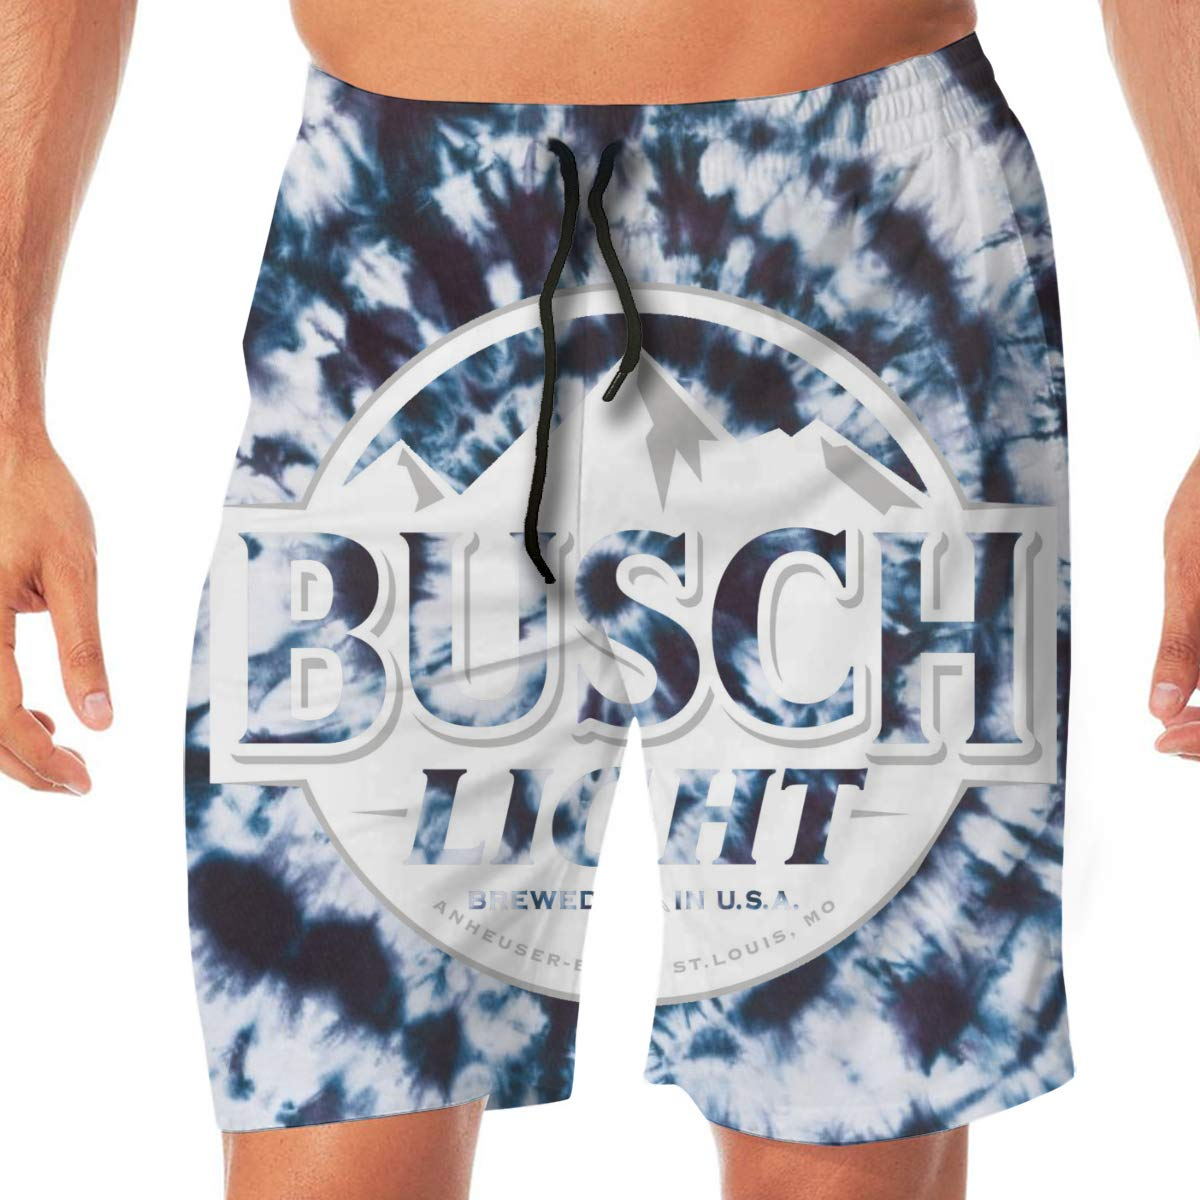 Tonhhuids Mens Beer Theme Tie-Dye Summer Holiday Quick-Drying Swim Trunks Beach Shorts Board Shorts